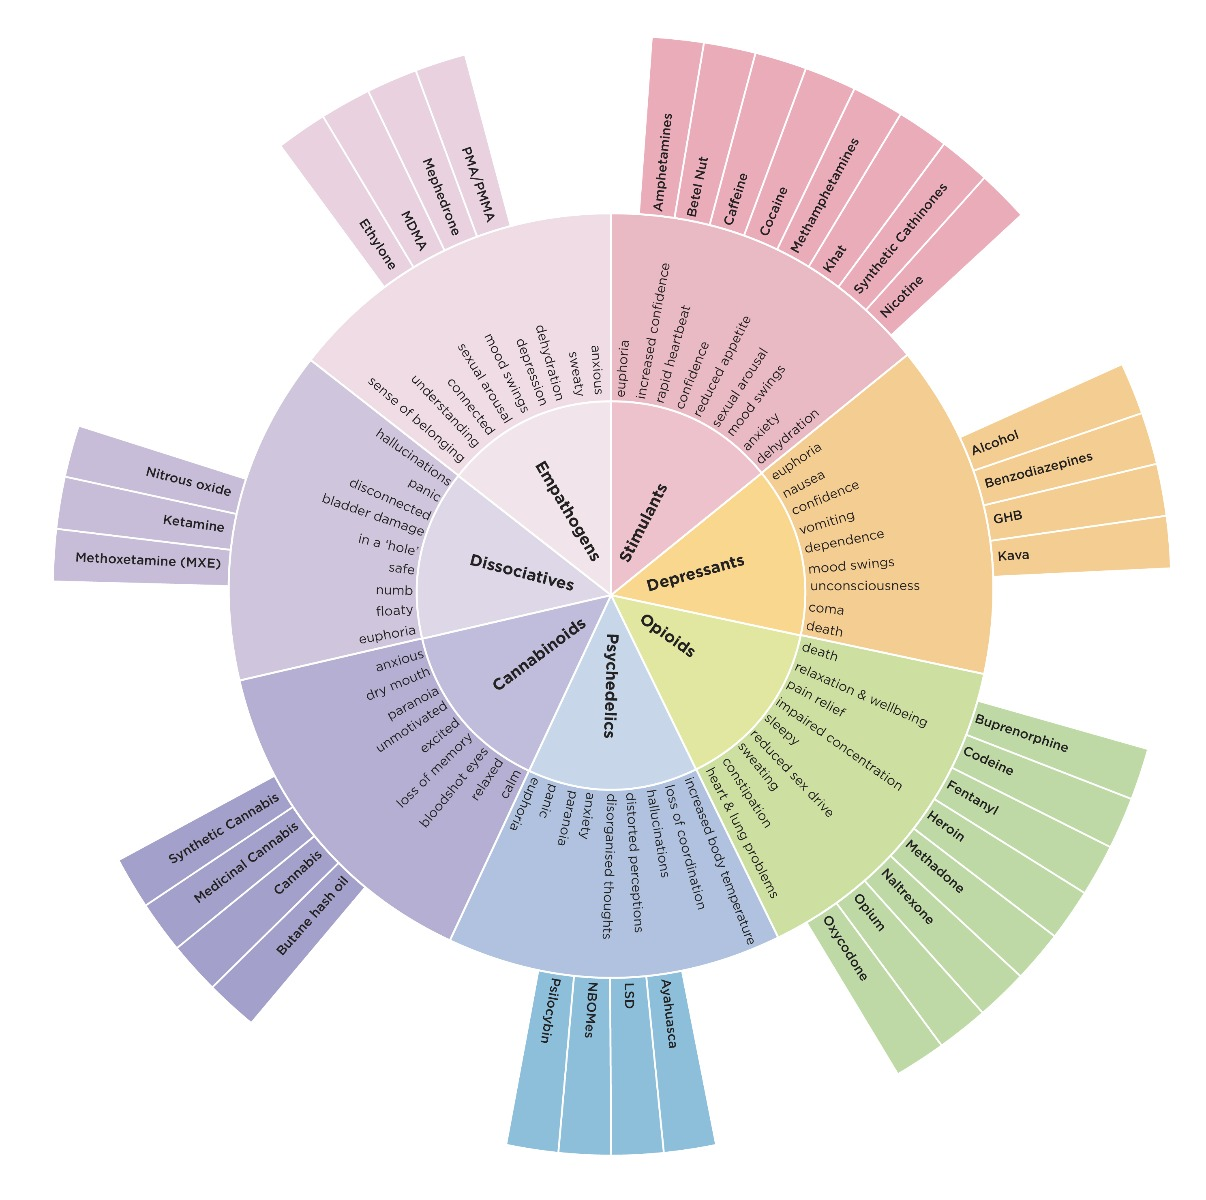 Drug Wheel